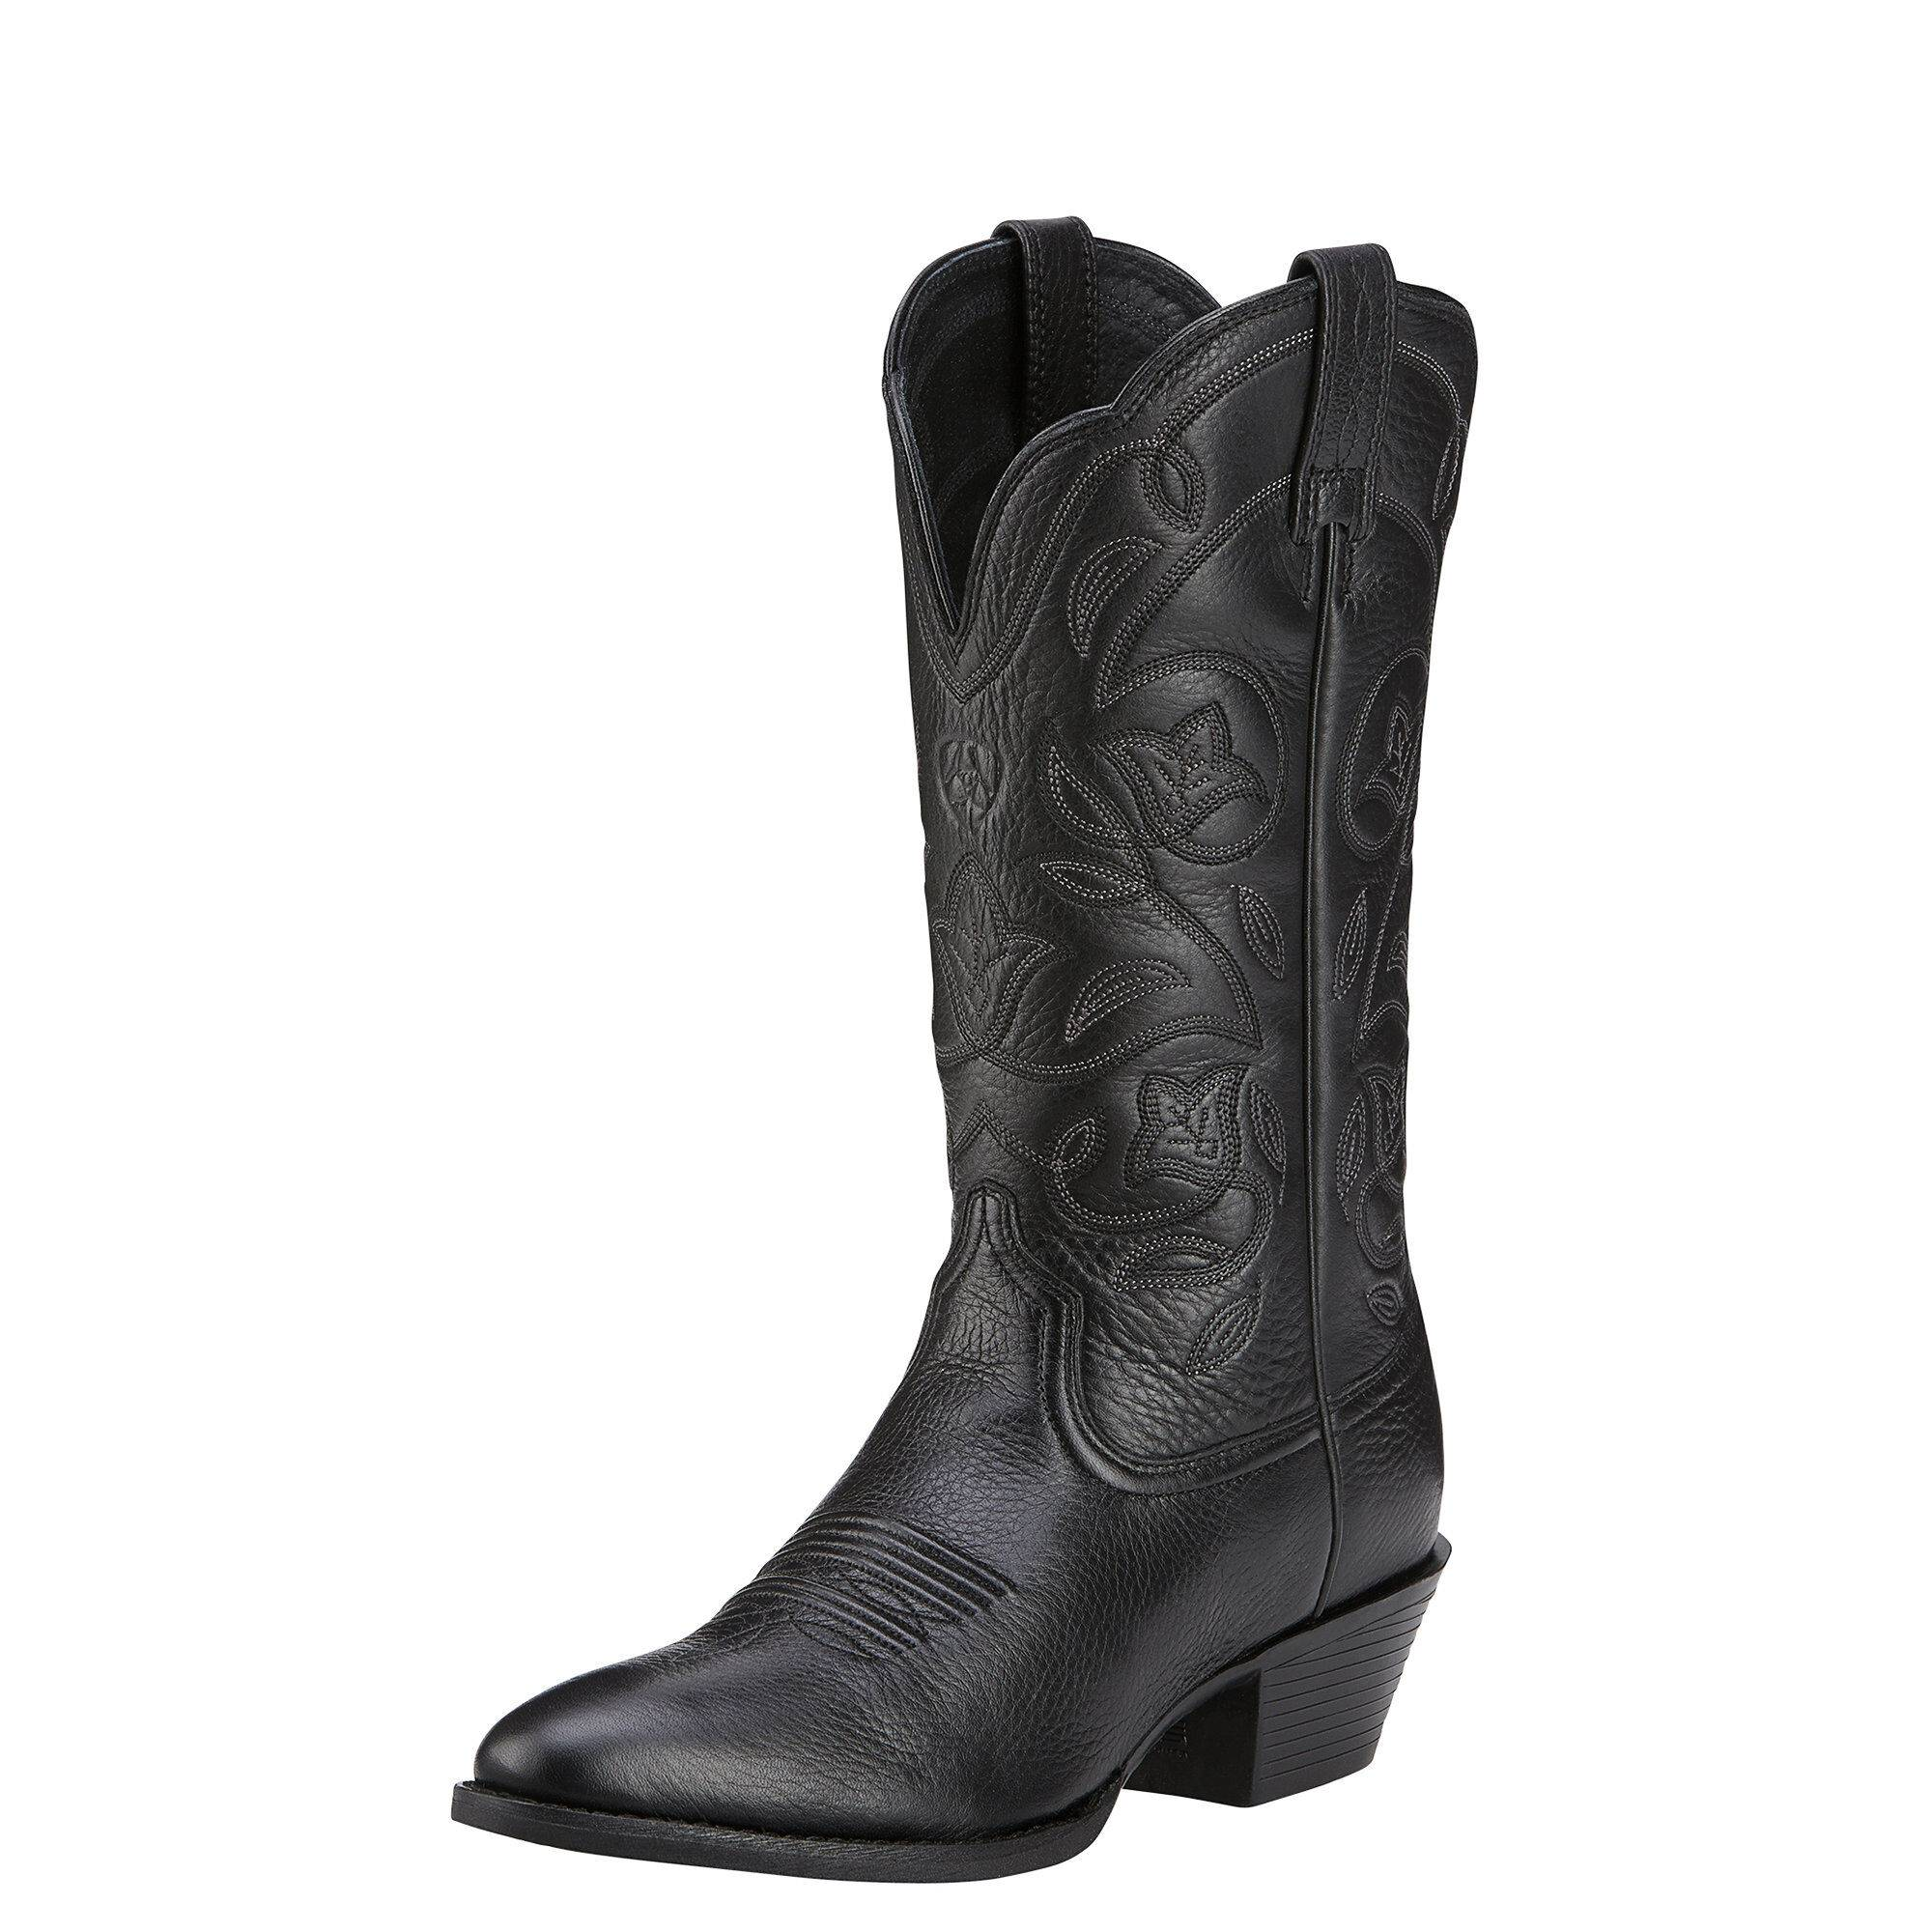 Ariat Women's Heritage R Toe Western Boots in Black Deertan, Size 10 B / Medium by Ariat